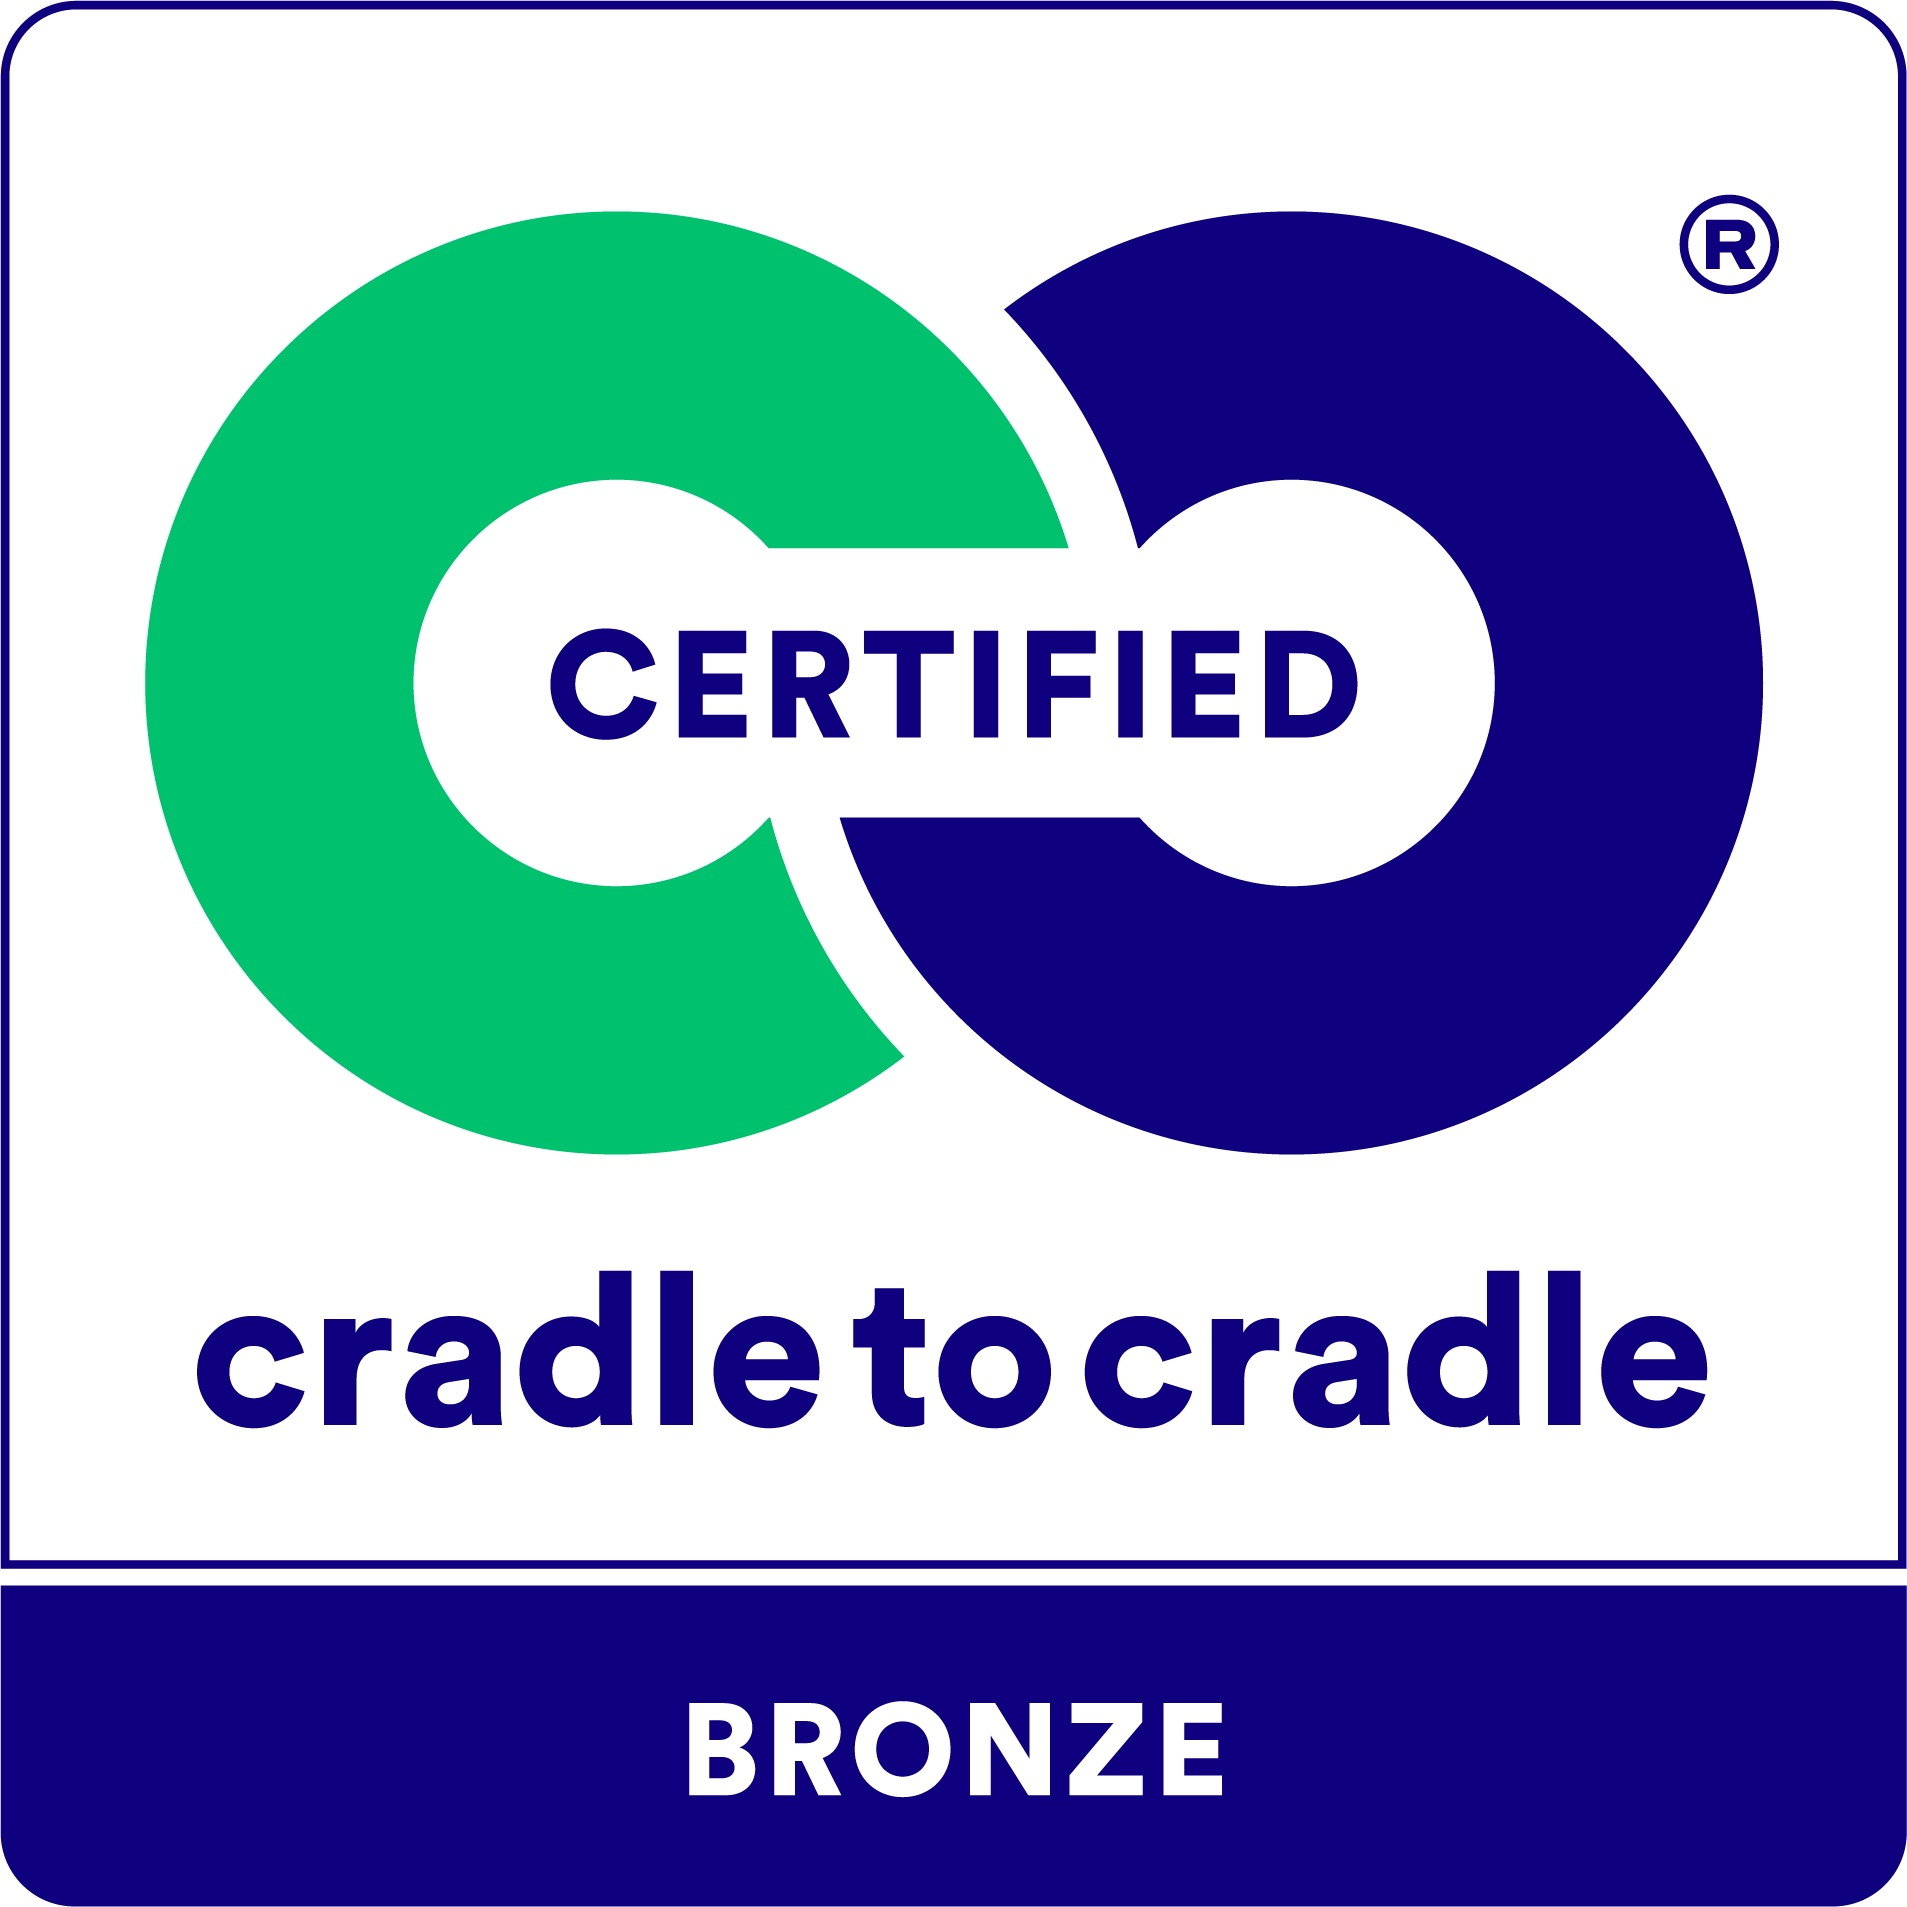 werteorientierte_perspektiven_cradle_to_cradle_logo_bronze